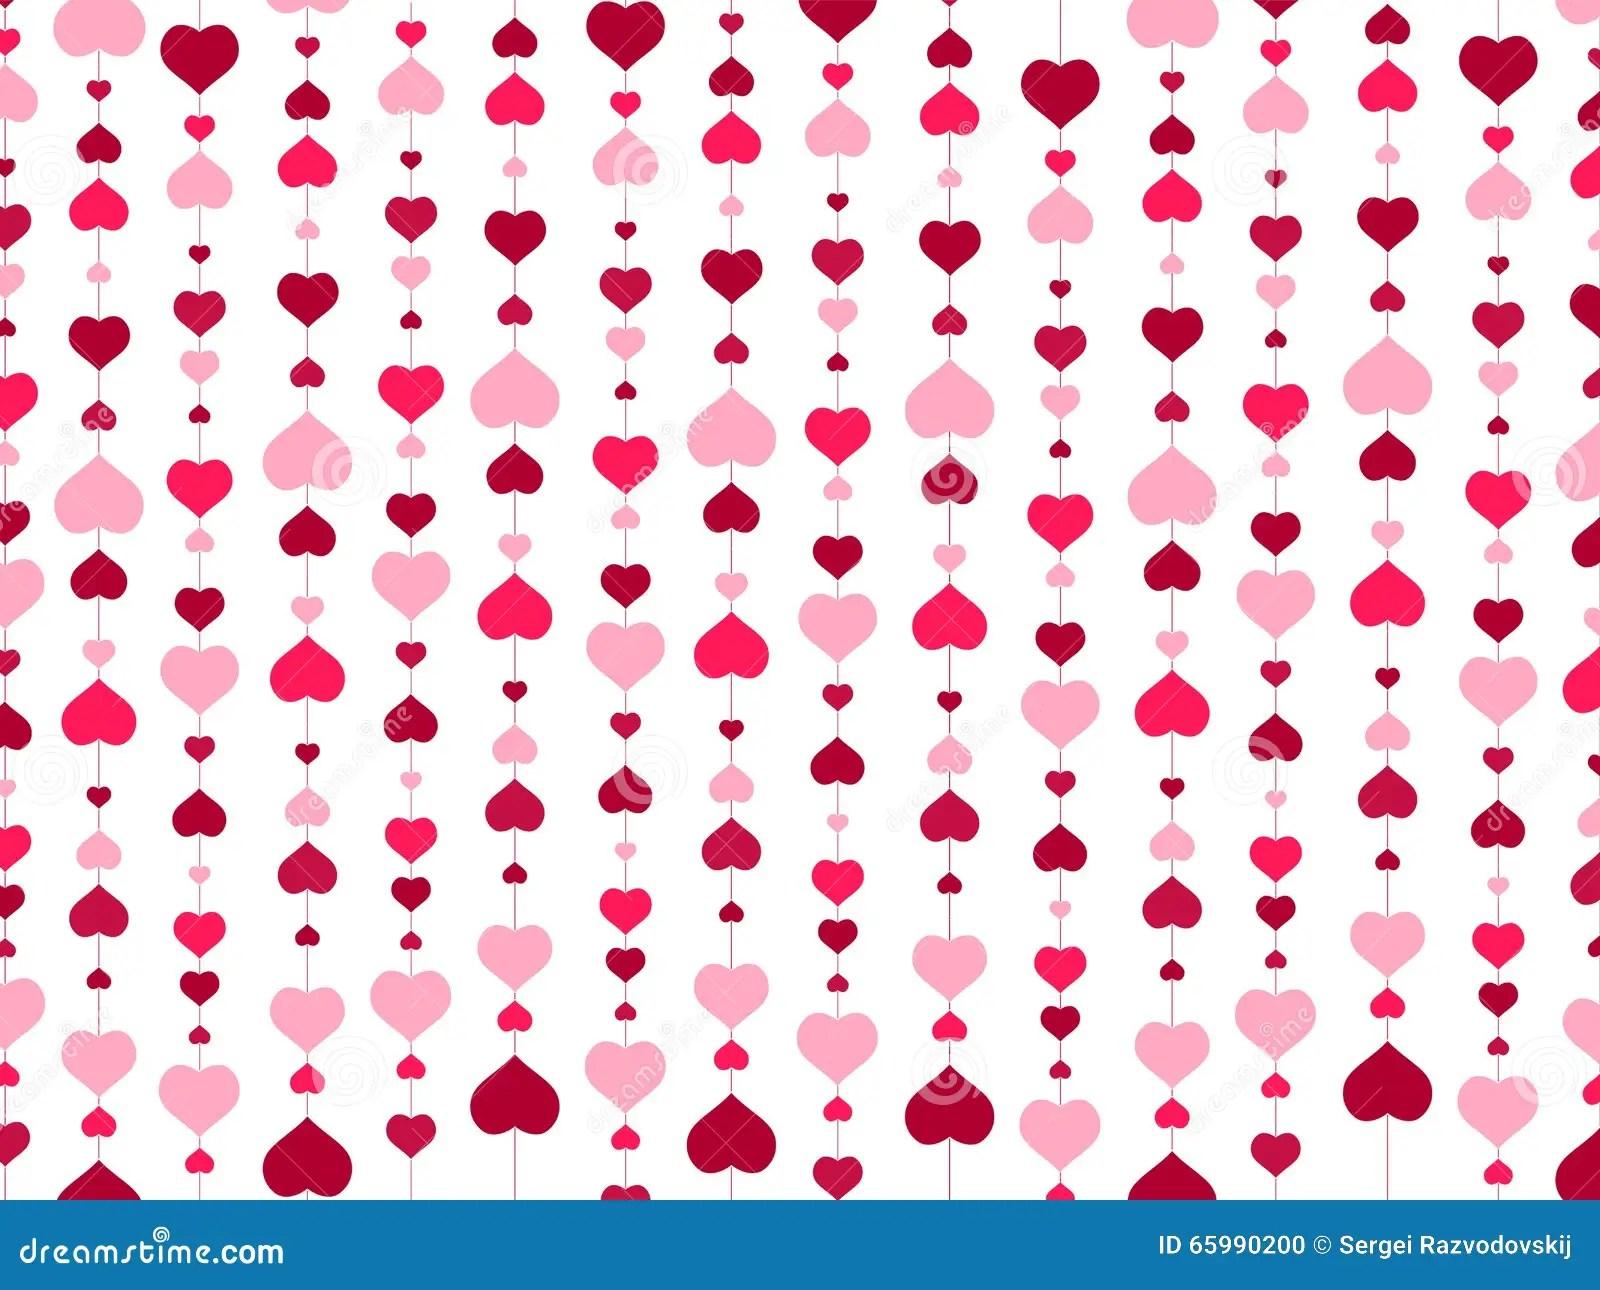 Wallpaper San Valentin 3d Valentine Day Heart Background Stock Vector Illustration